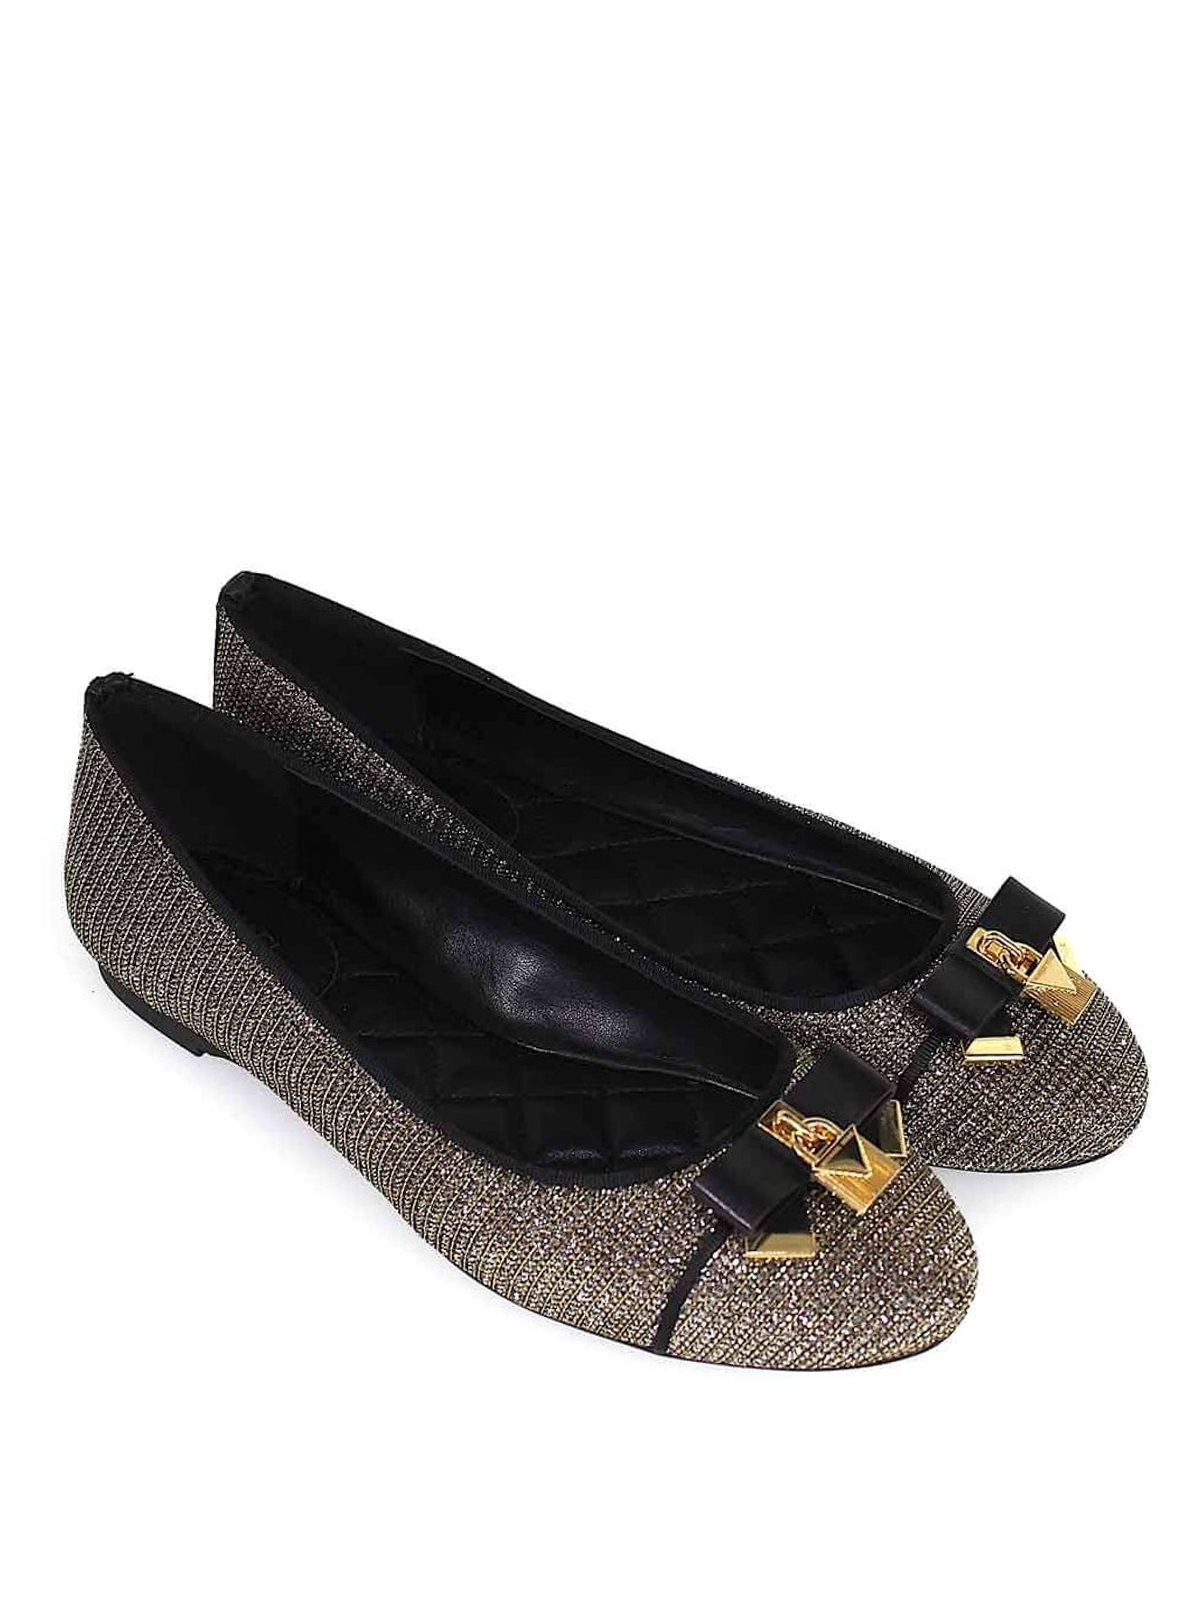 f93f17634cf4 MICHAEL KORS  flat shoes online - Alice Ballet silver metallic fibre  ballerinas